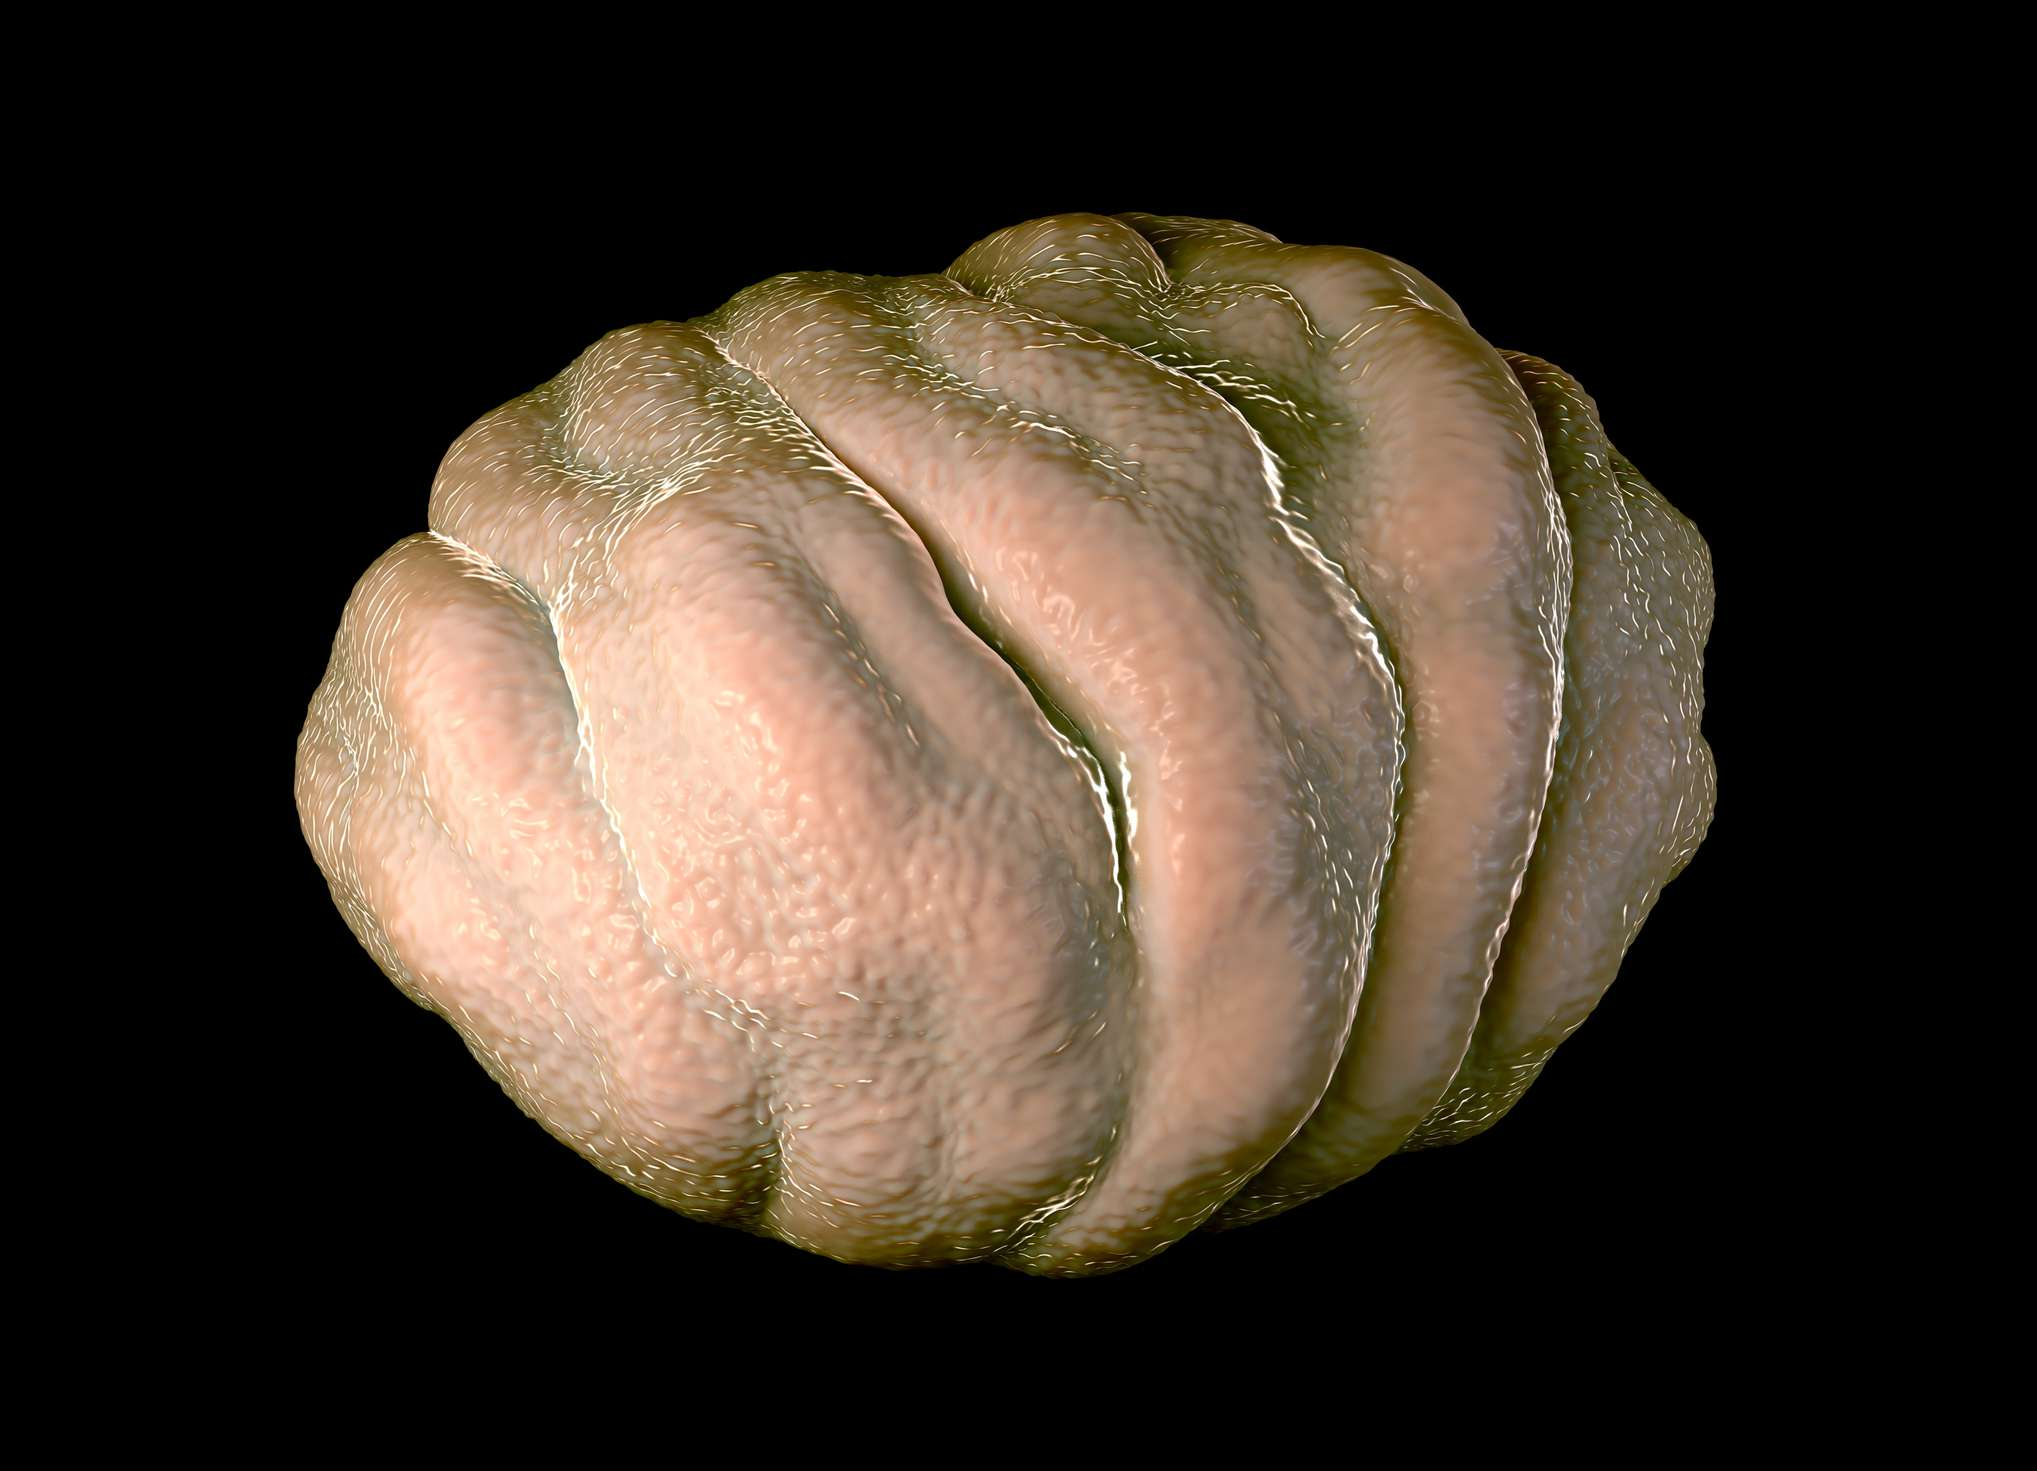 illustration of tardigrade in a tun state